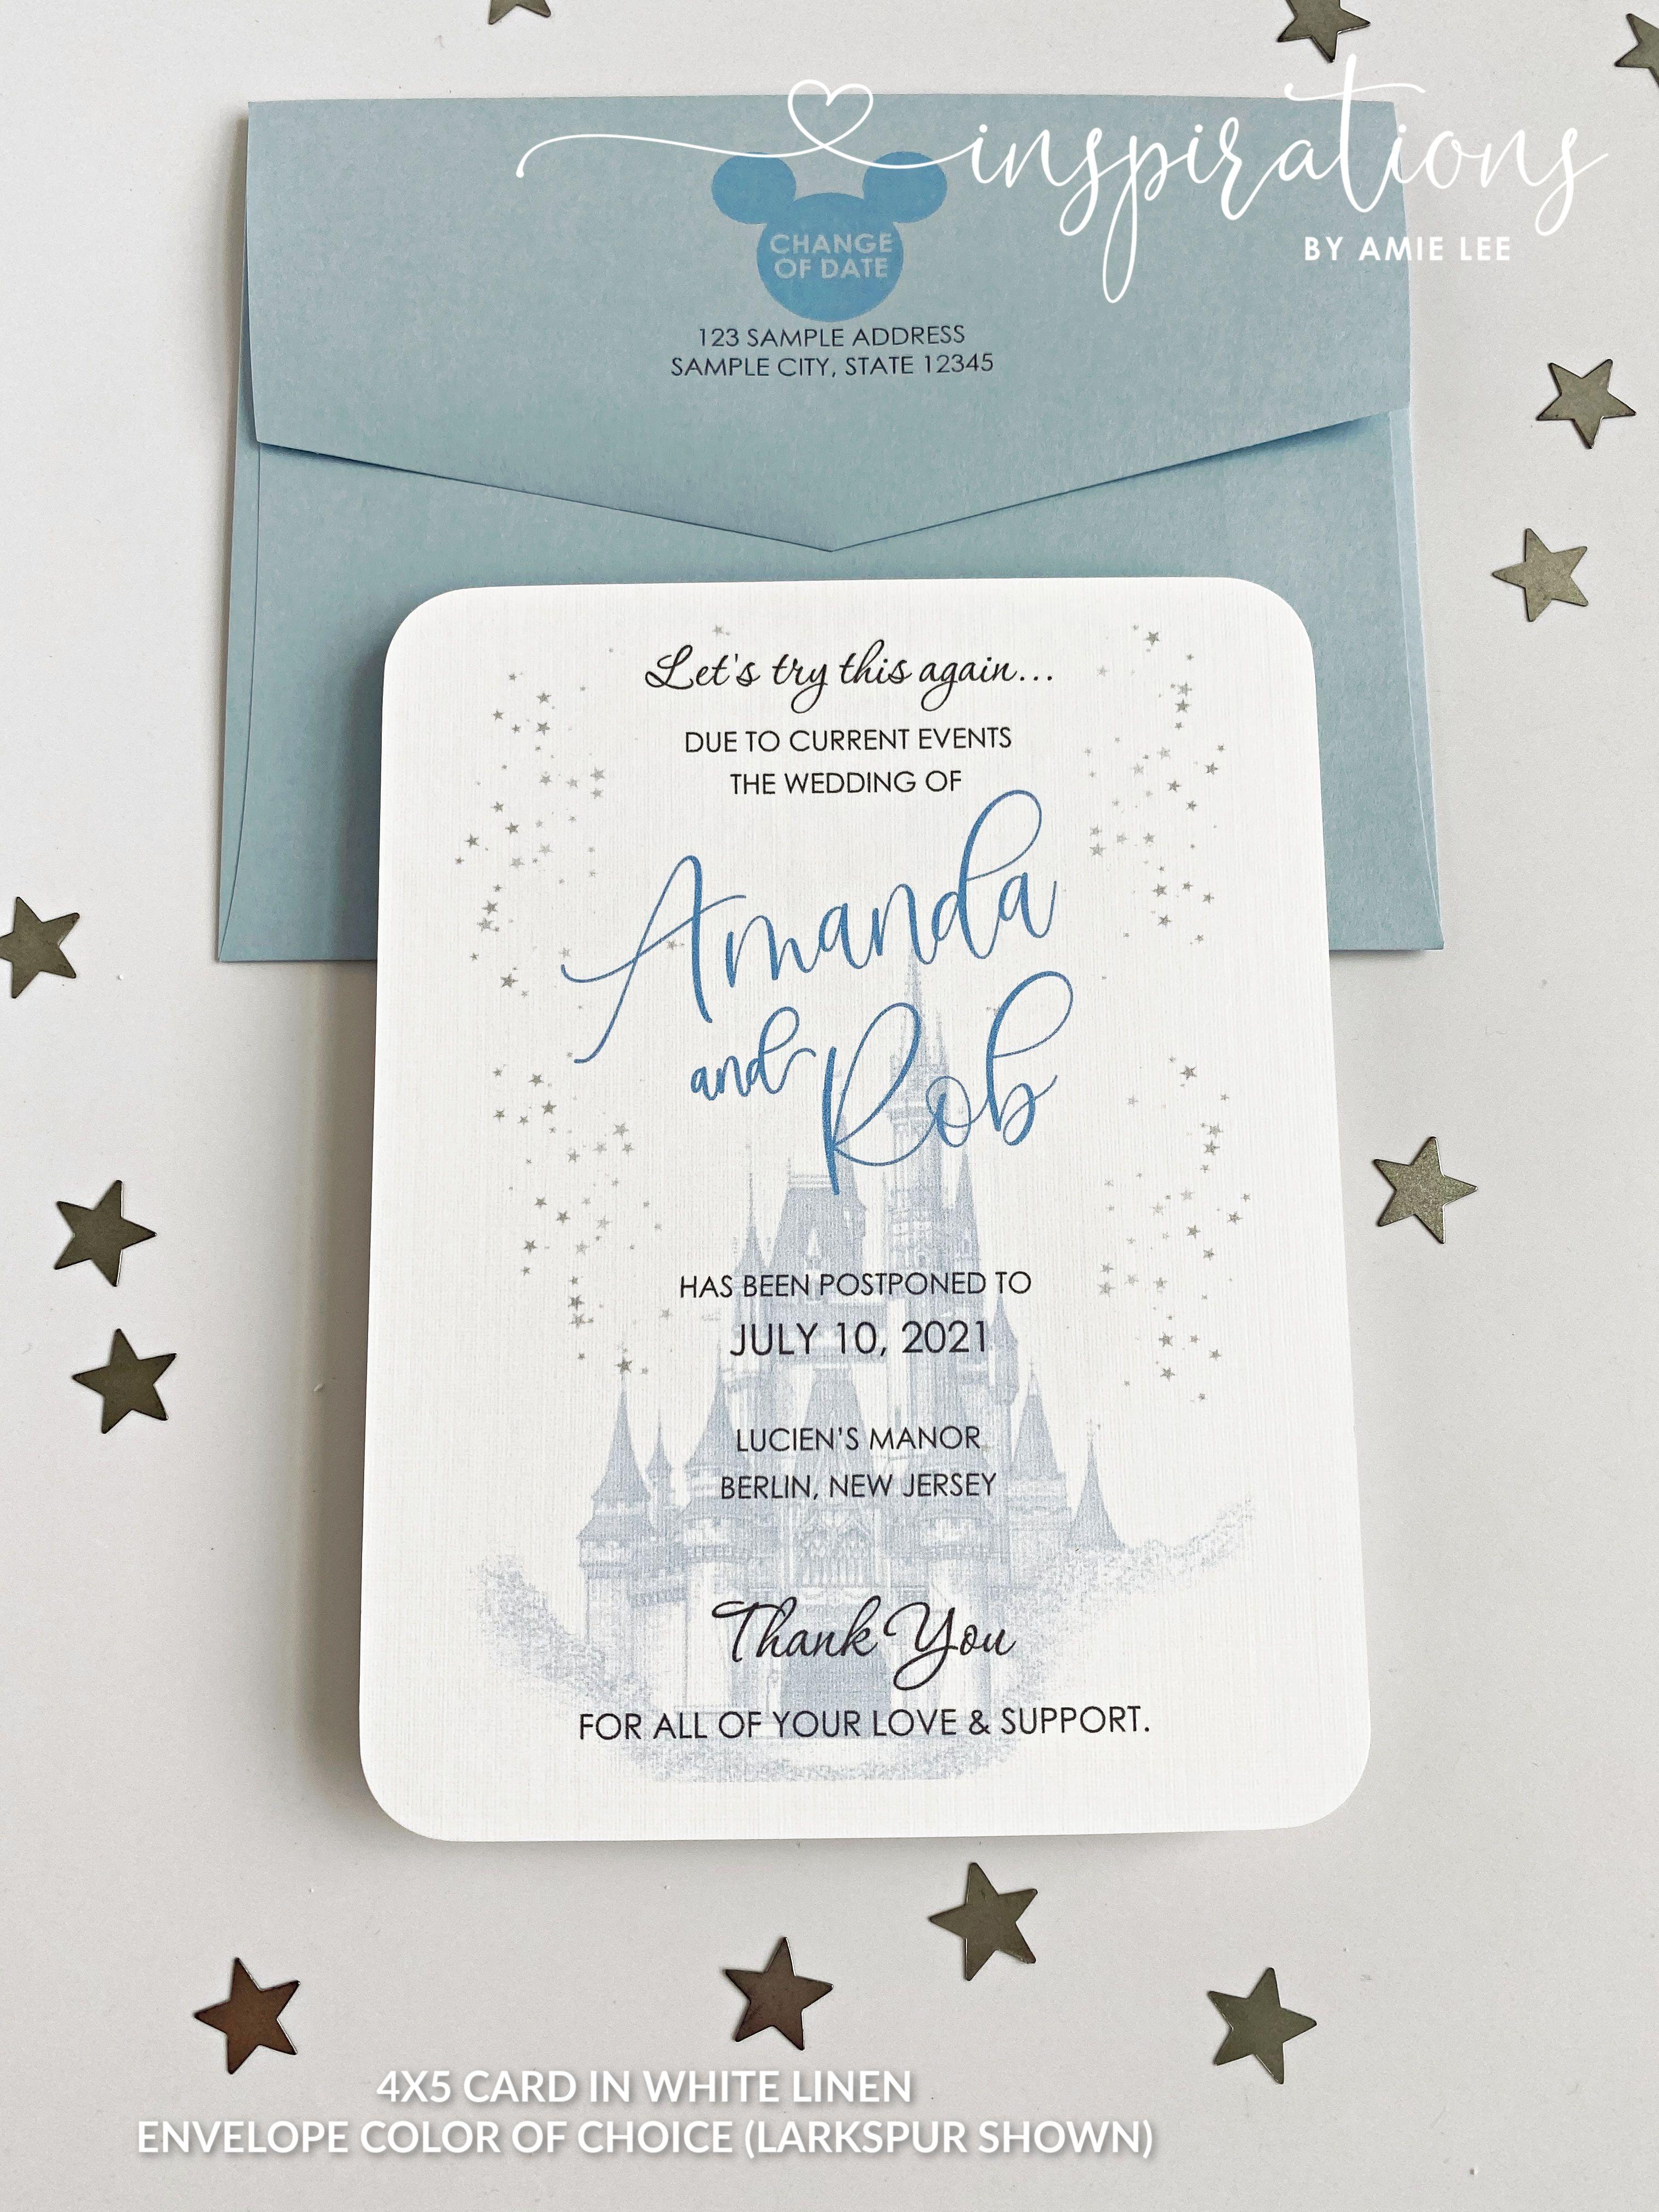 Change Of Date Disney Wedding Disney Change Of Date Fairy Etsy Cinderella Wedding Invitations Modern Wedding Invitation Wording Wedding Invitation Templates